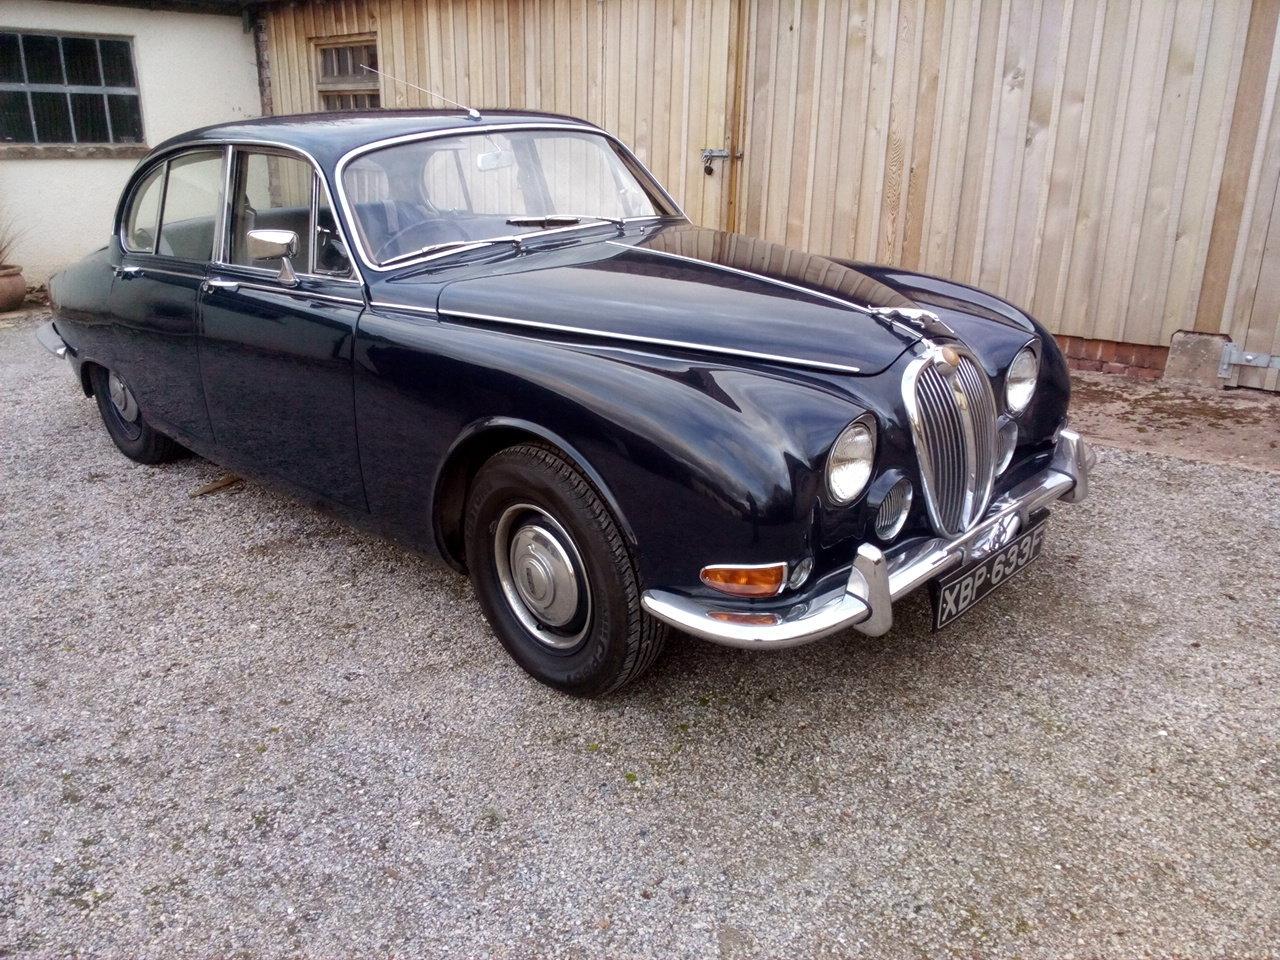 1968 Jaguar s-type 3.4 automatic – excellent cond For Sale (picture 1 of 6)